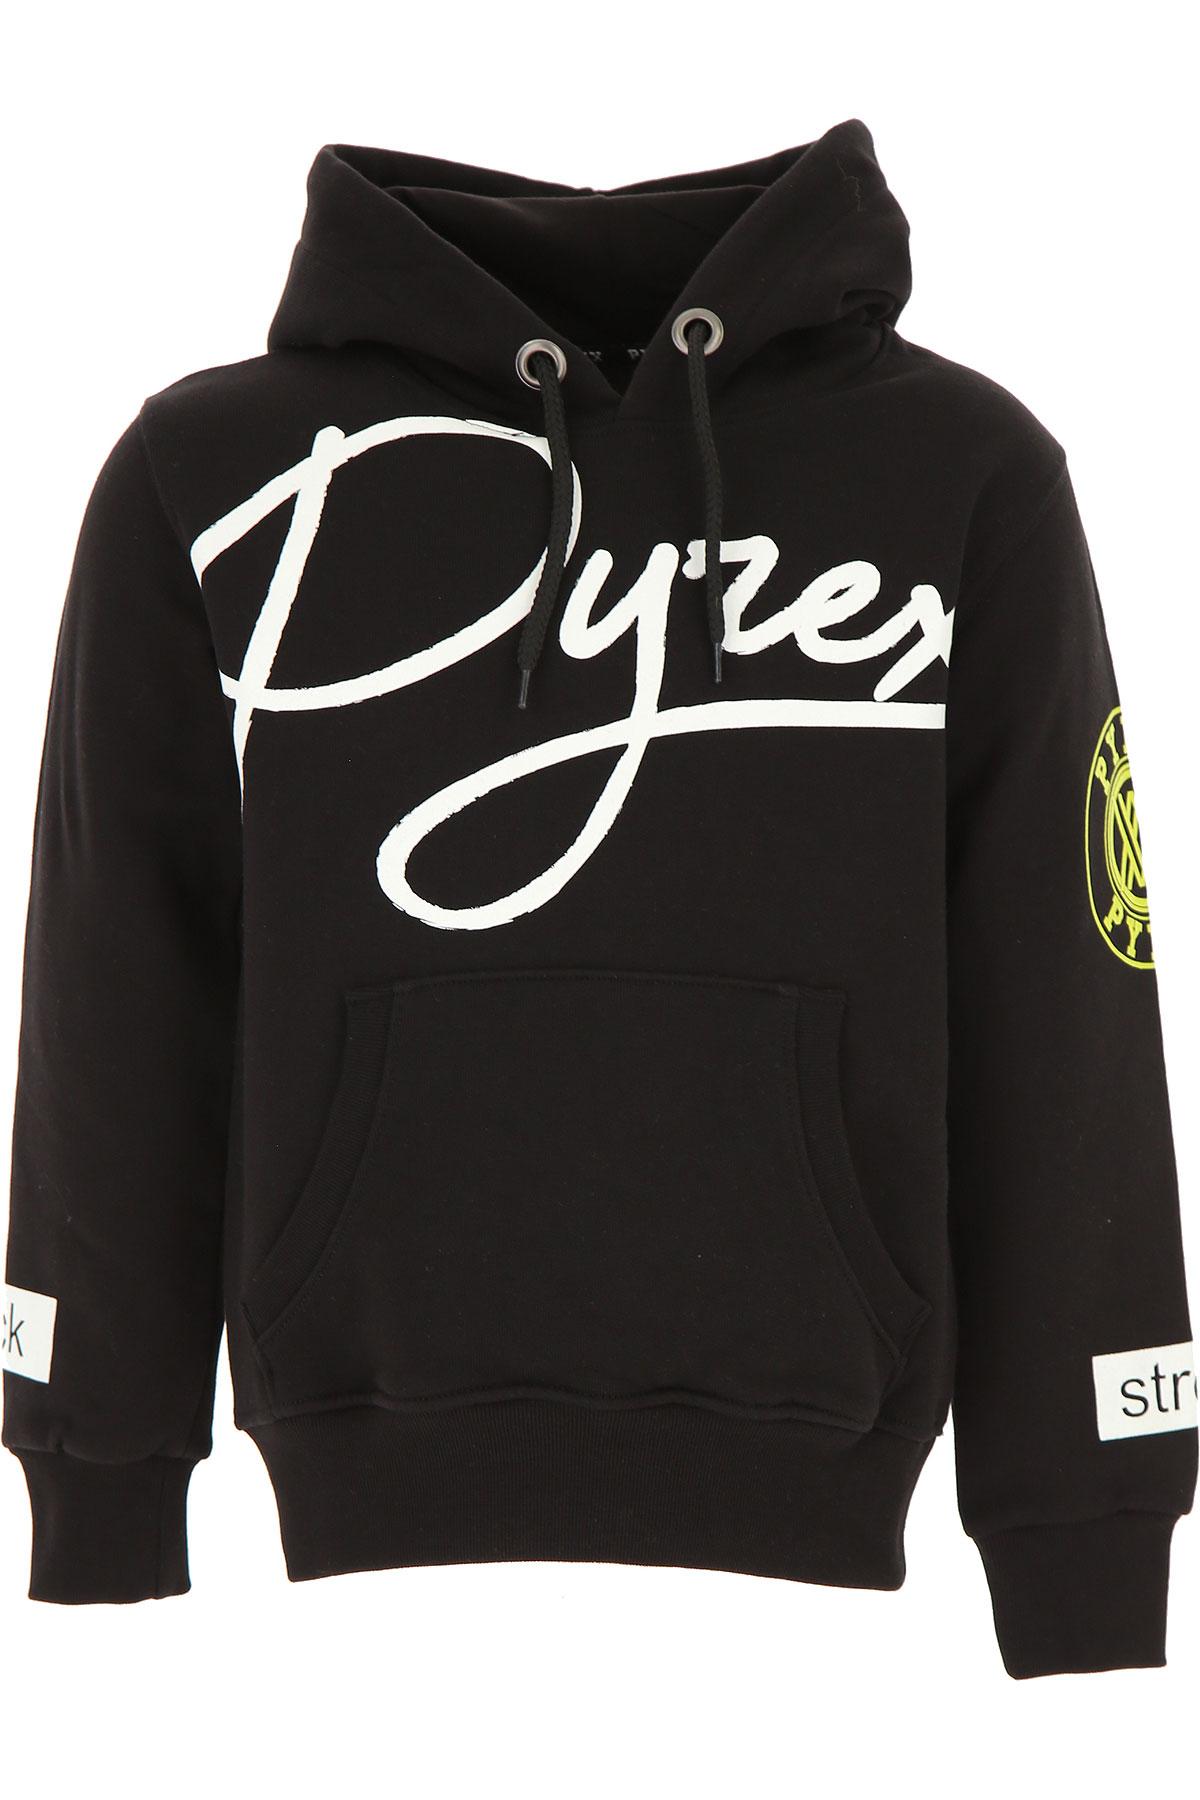 Pyrex Kids Sweatshirts & Hoodies for Boys On Sale, Black, Cotton, 2019, M S XL XS XXL (16 Y)